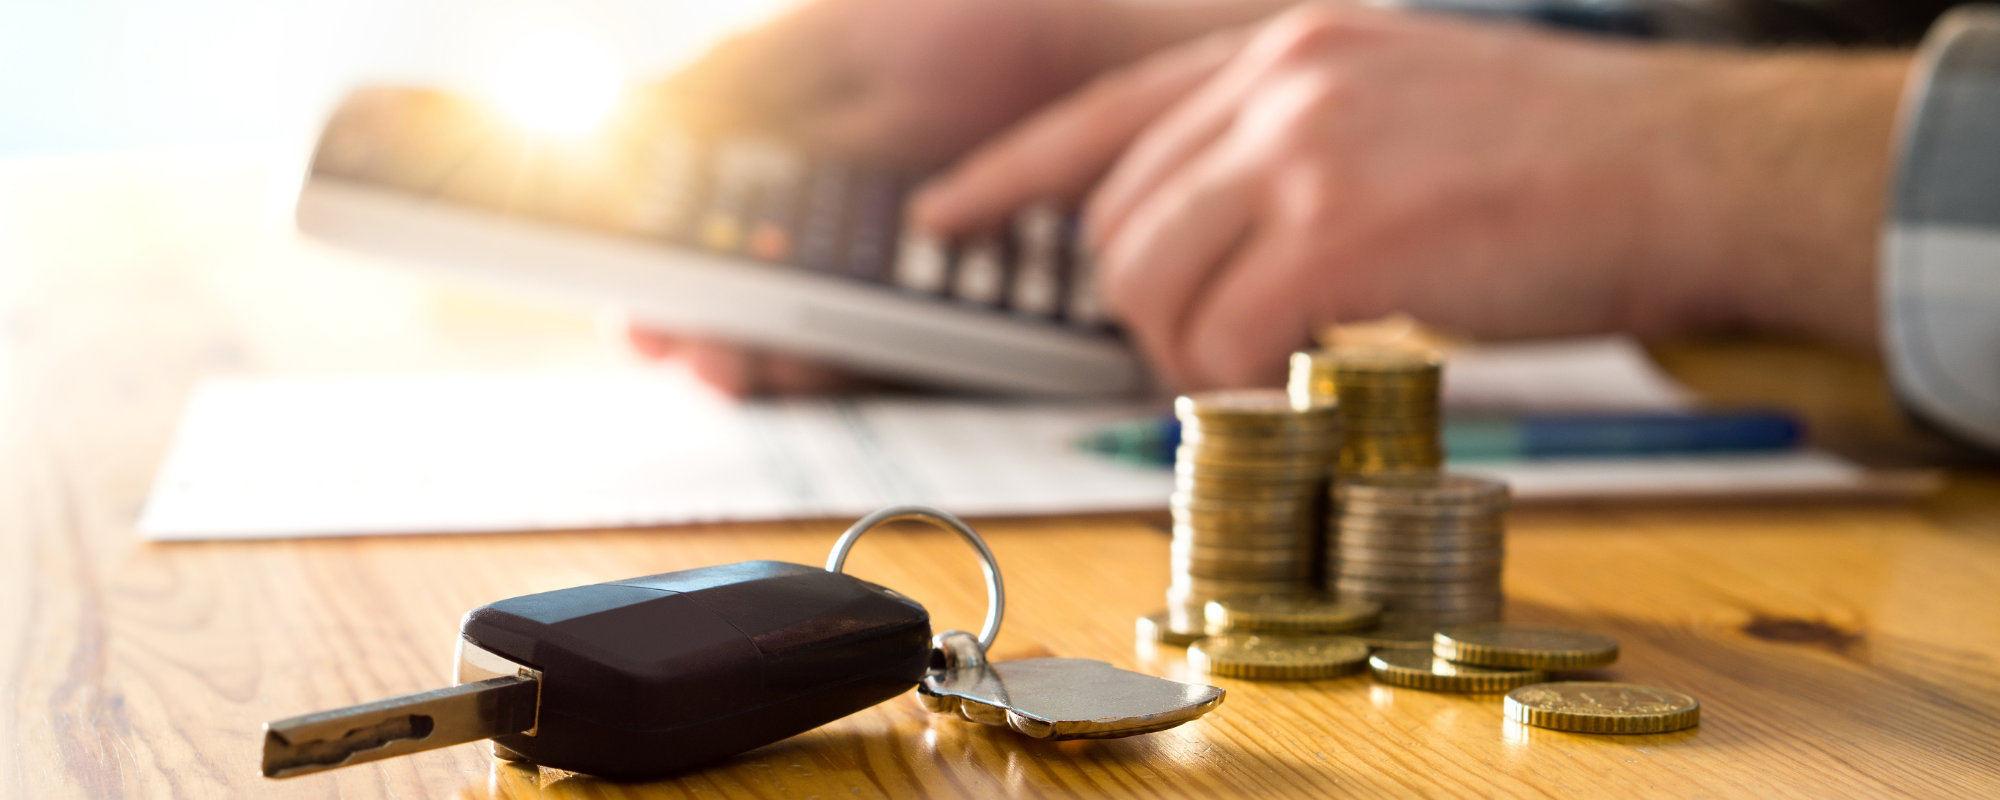 Ford finansiering og forsikring